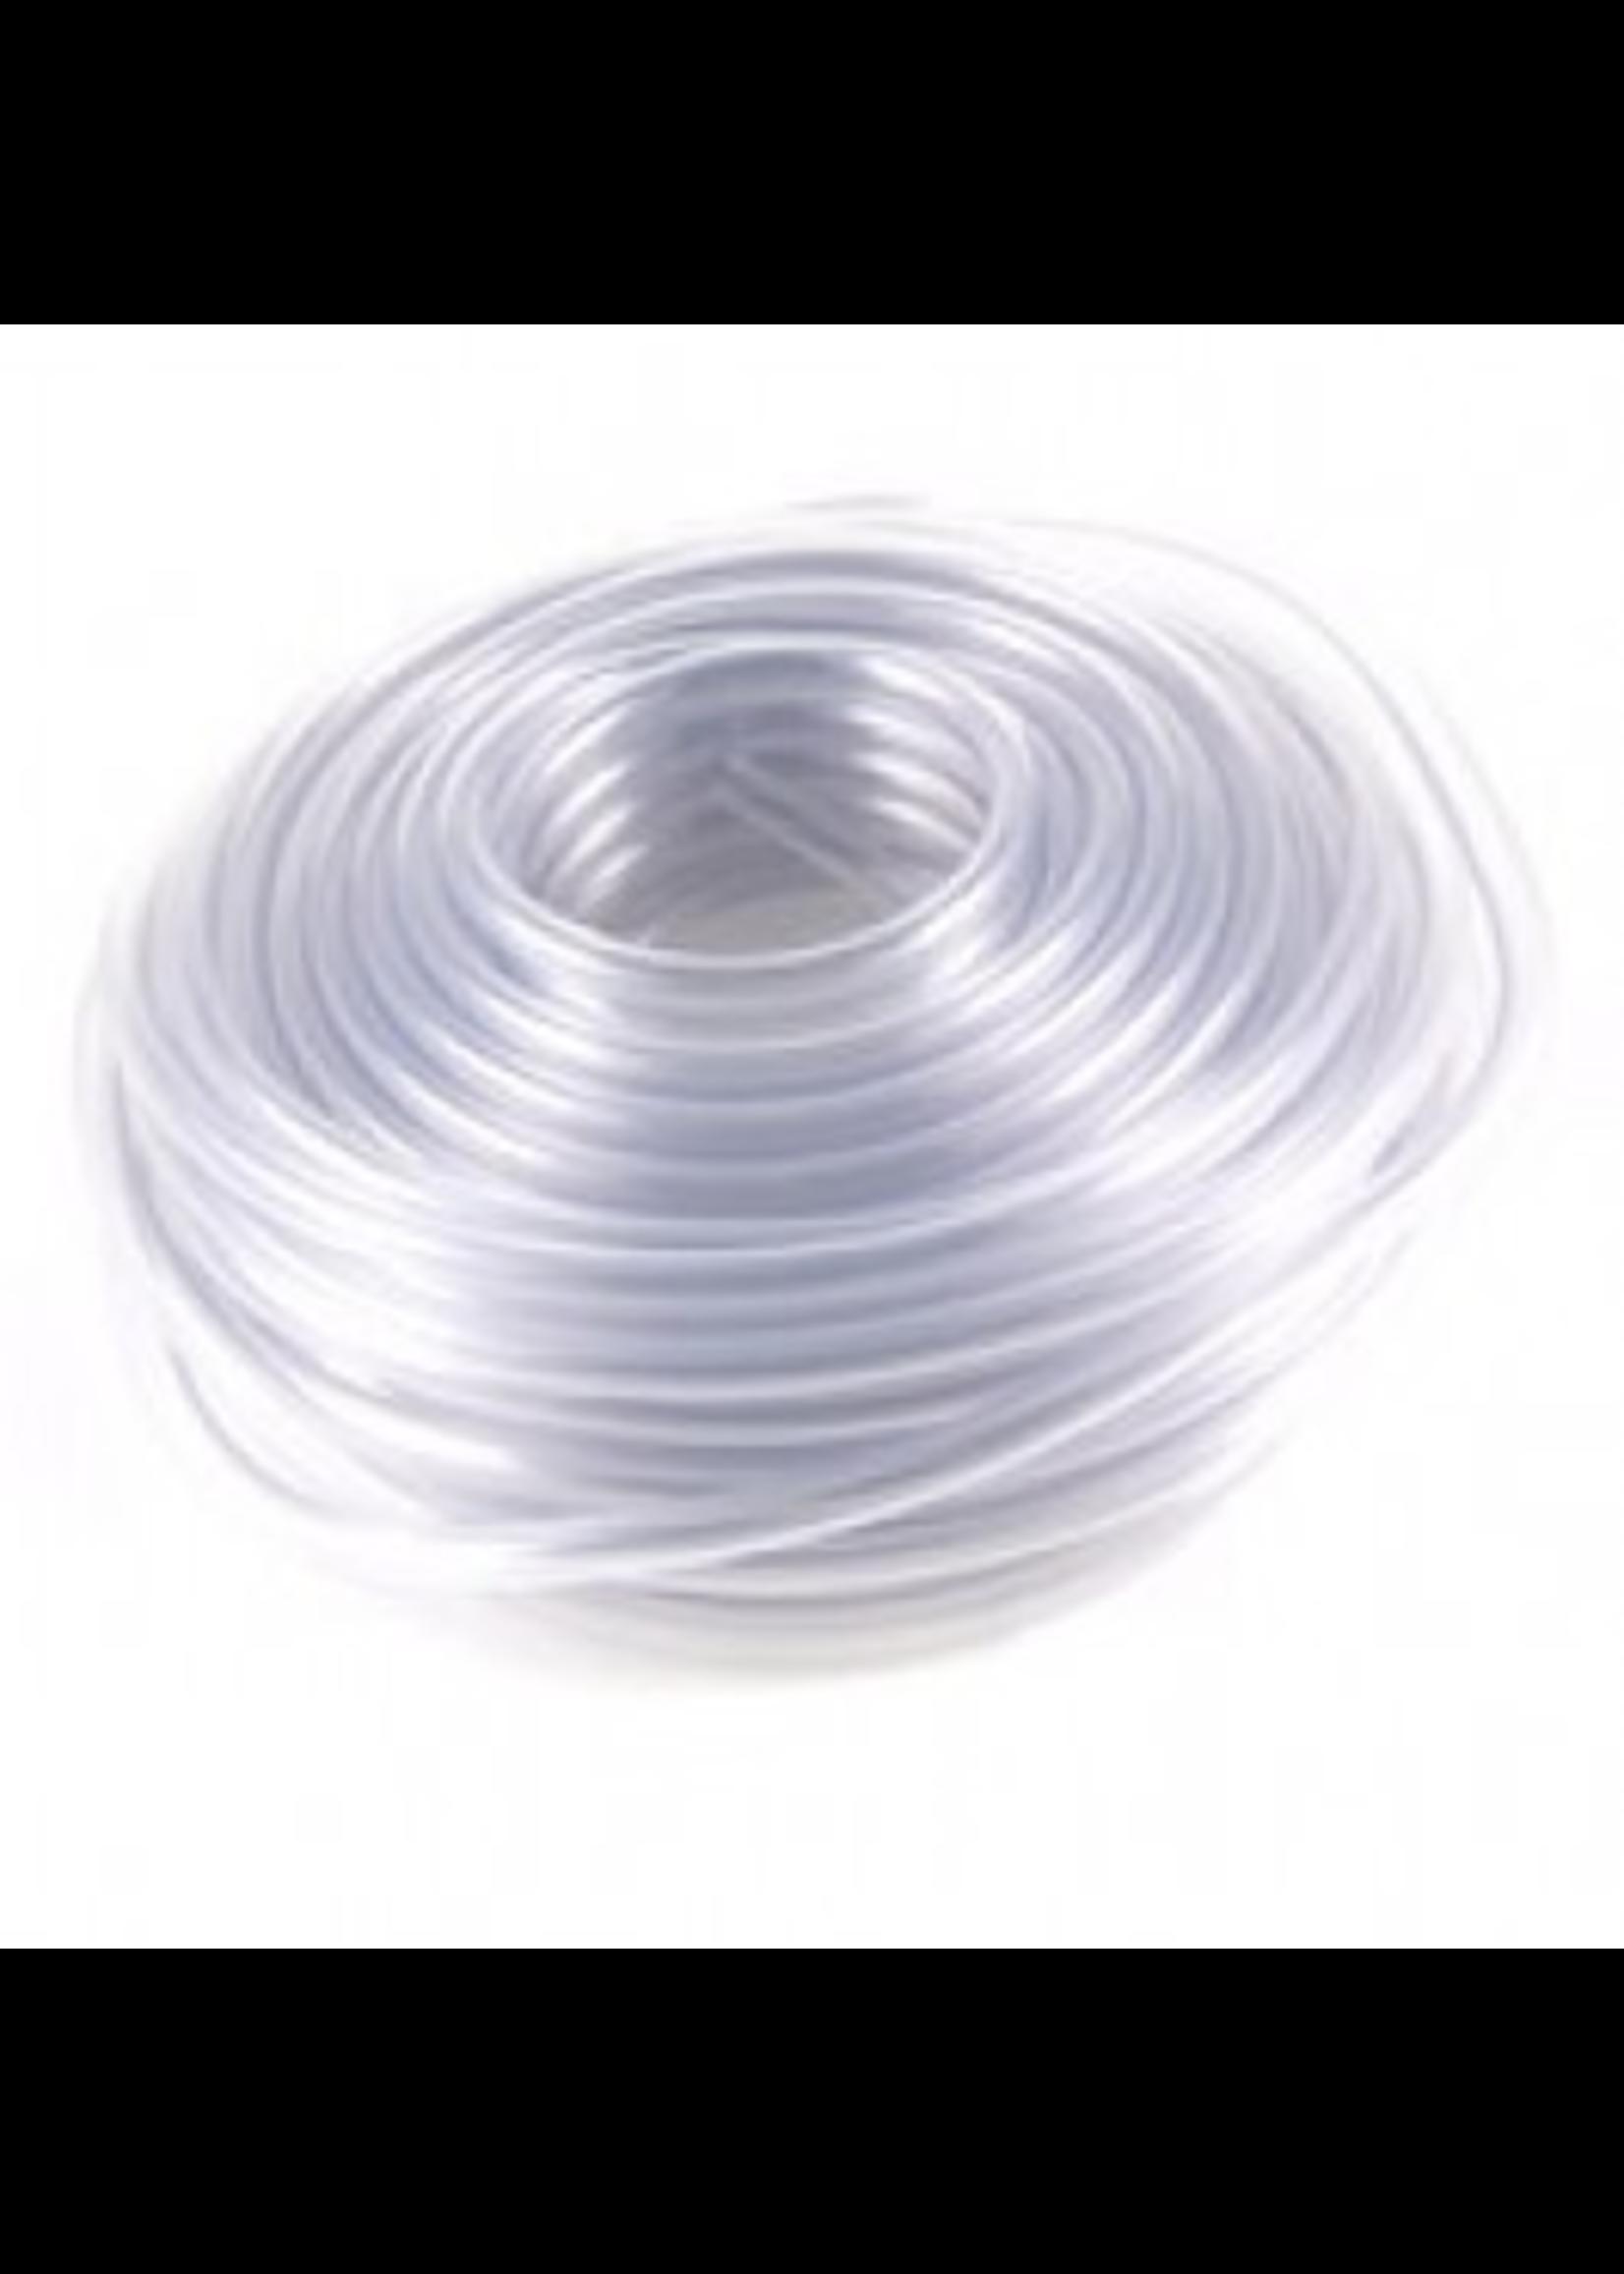 "Tubing Siphon Hose - 1/4"" ID Tubing - 1' Length"